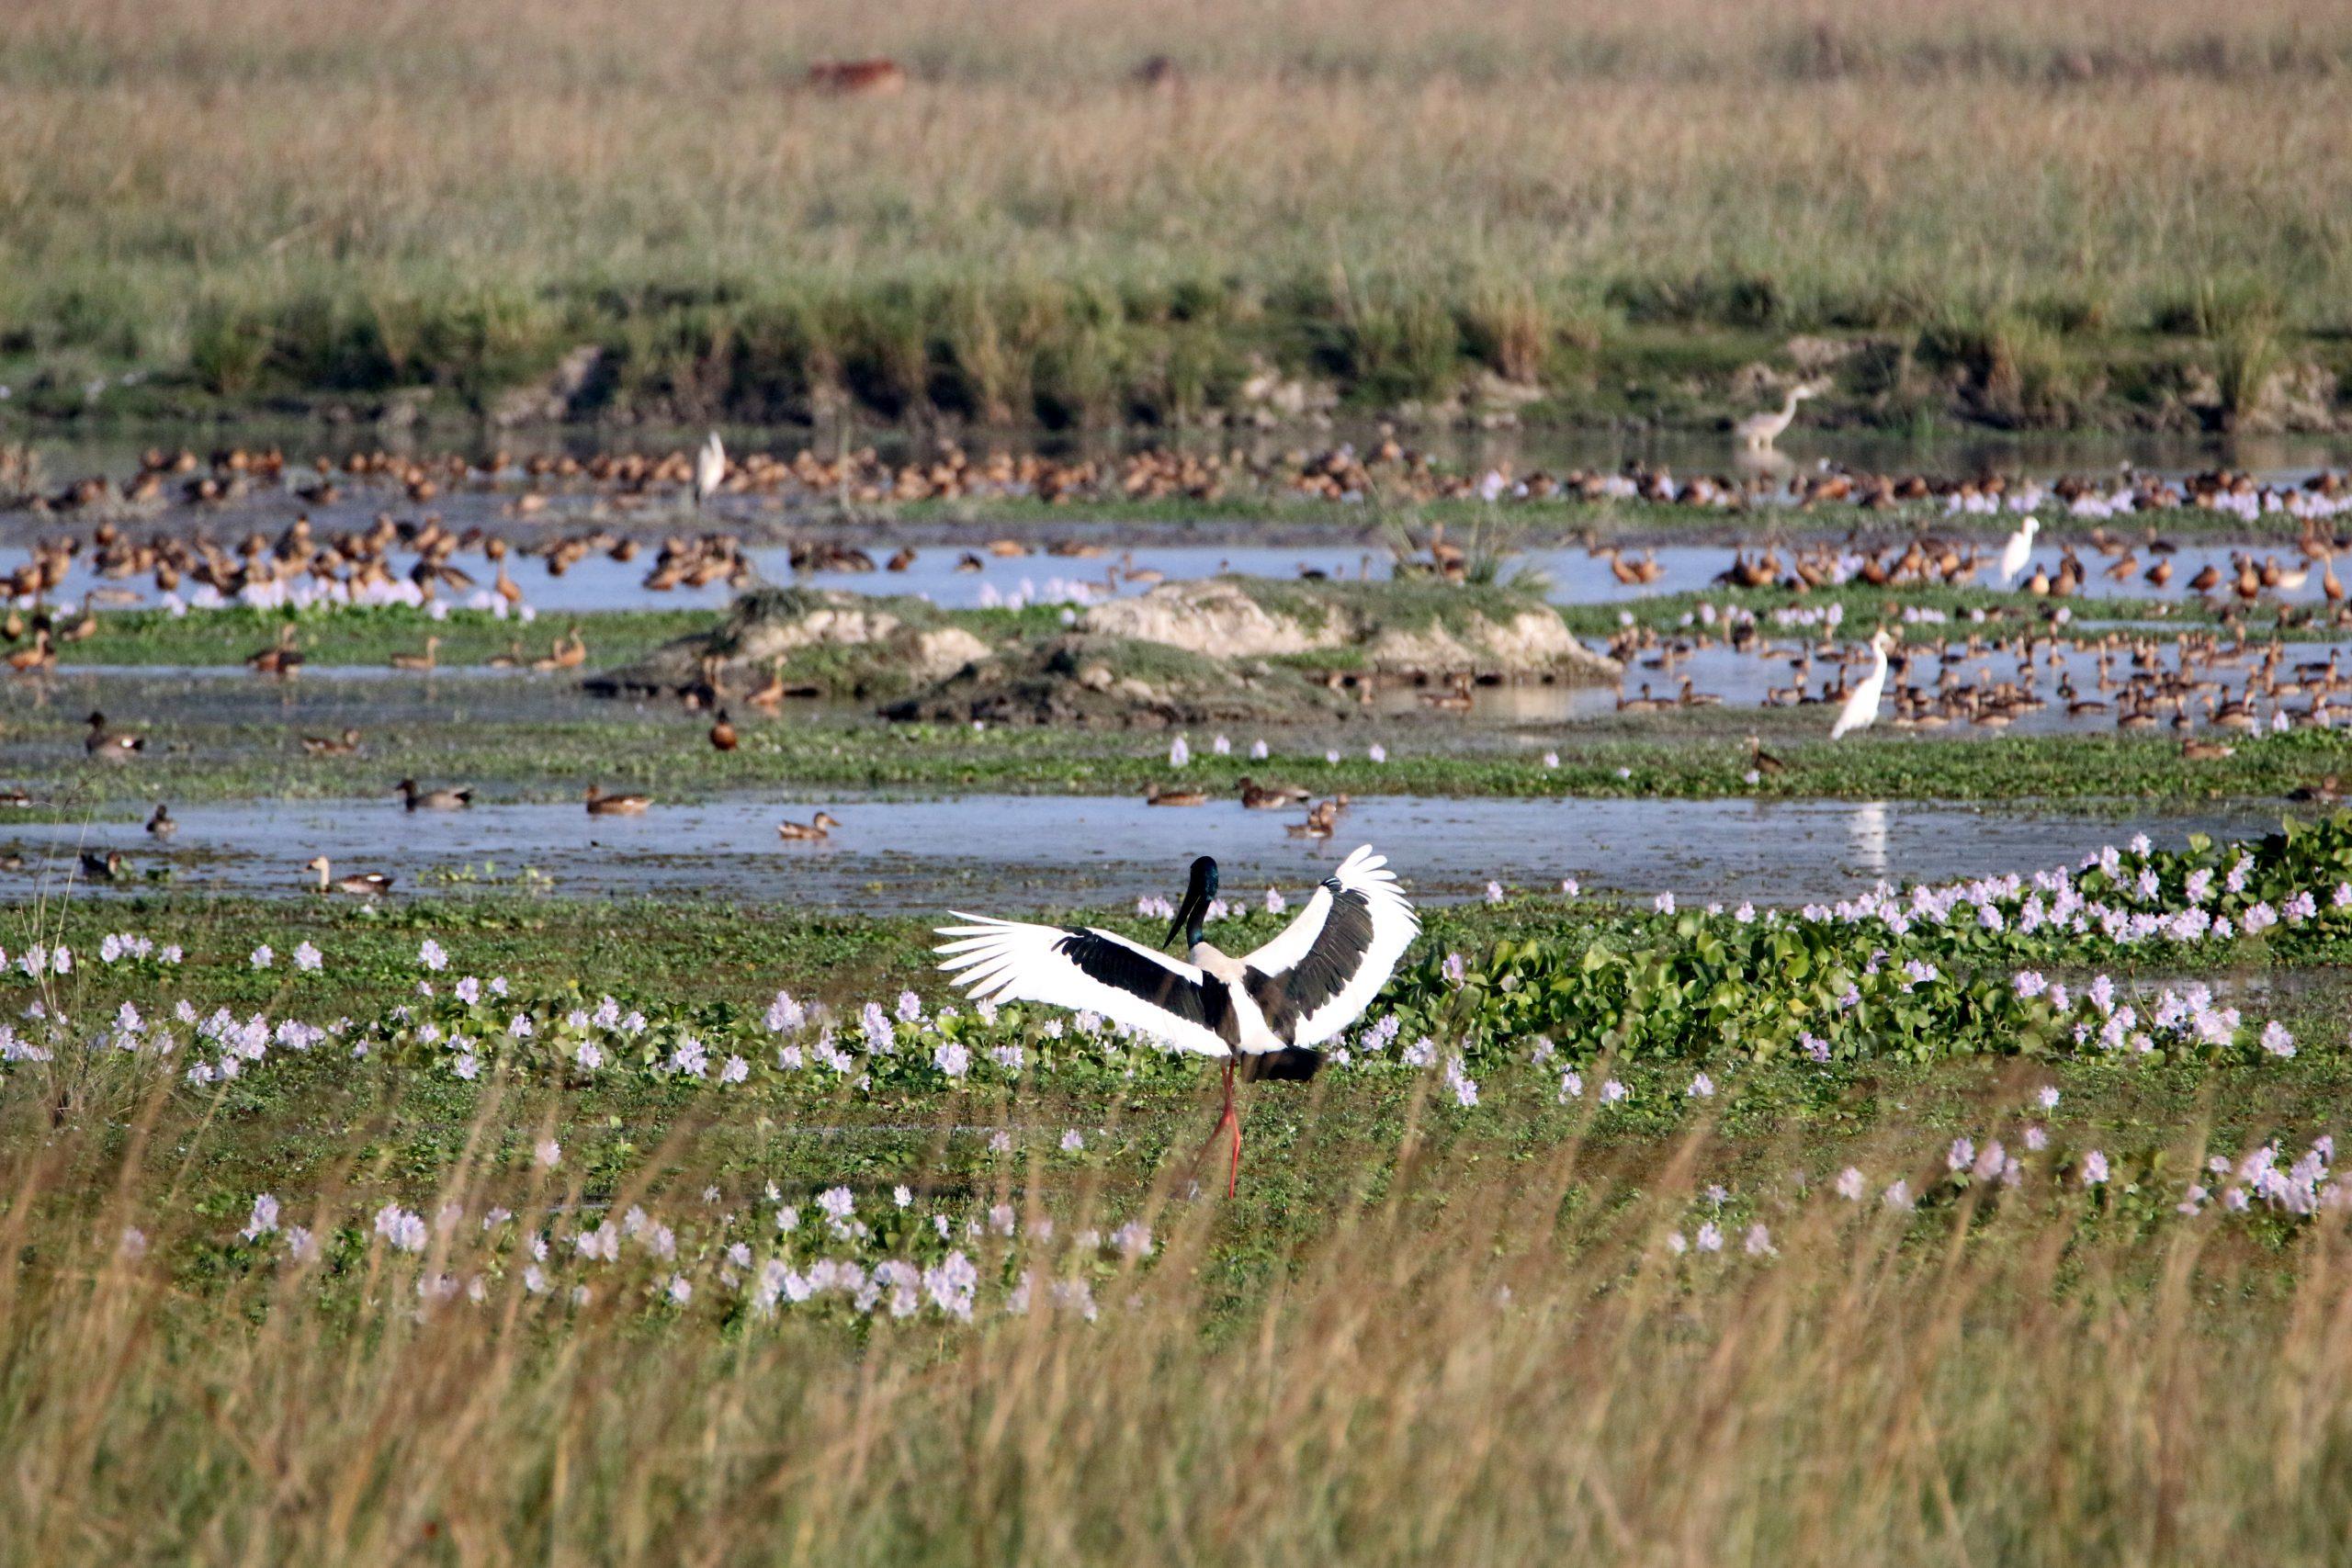 A stork landing near a pond